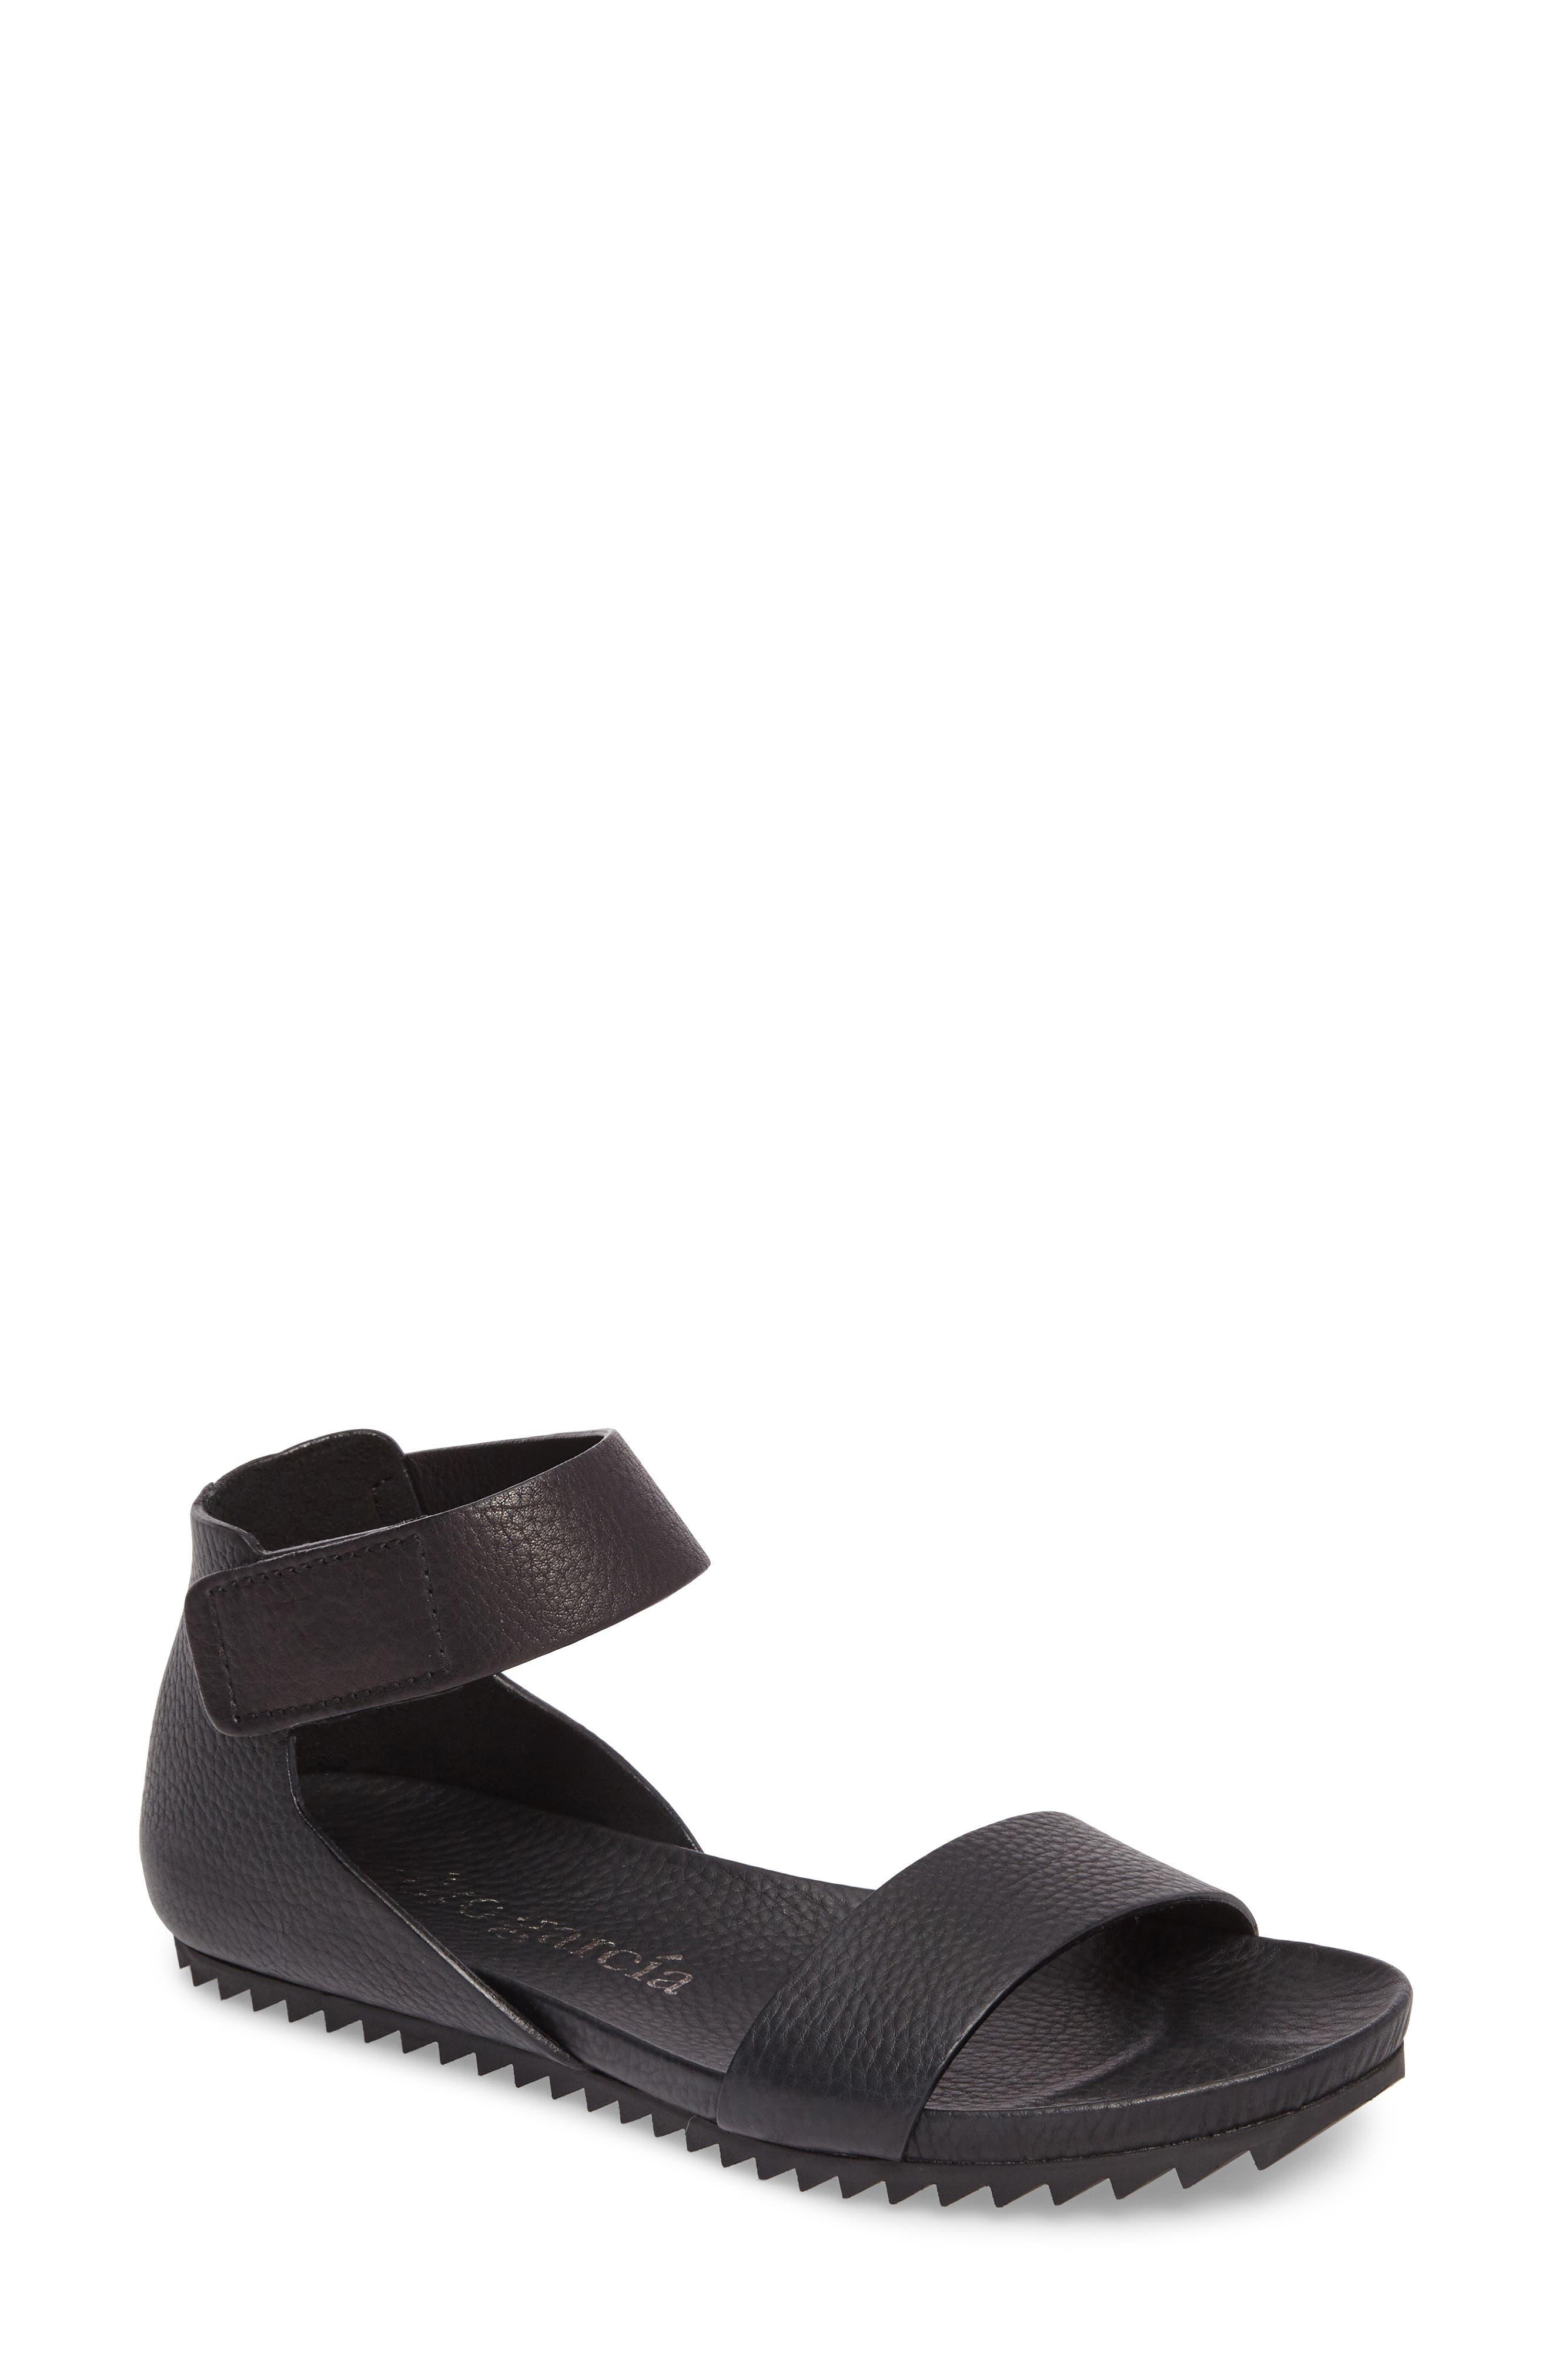 Main Image - Pedro Garcia Jalila Ankle Strap Sandal (Women) (Nordstrom Exclusive)